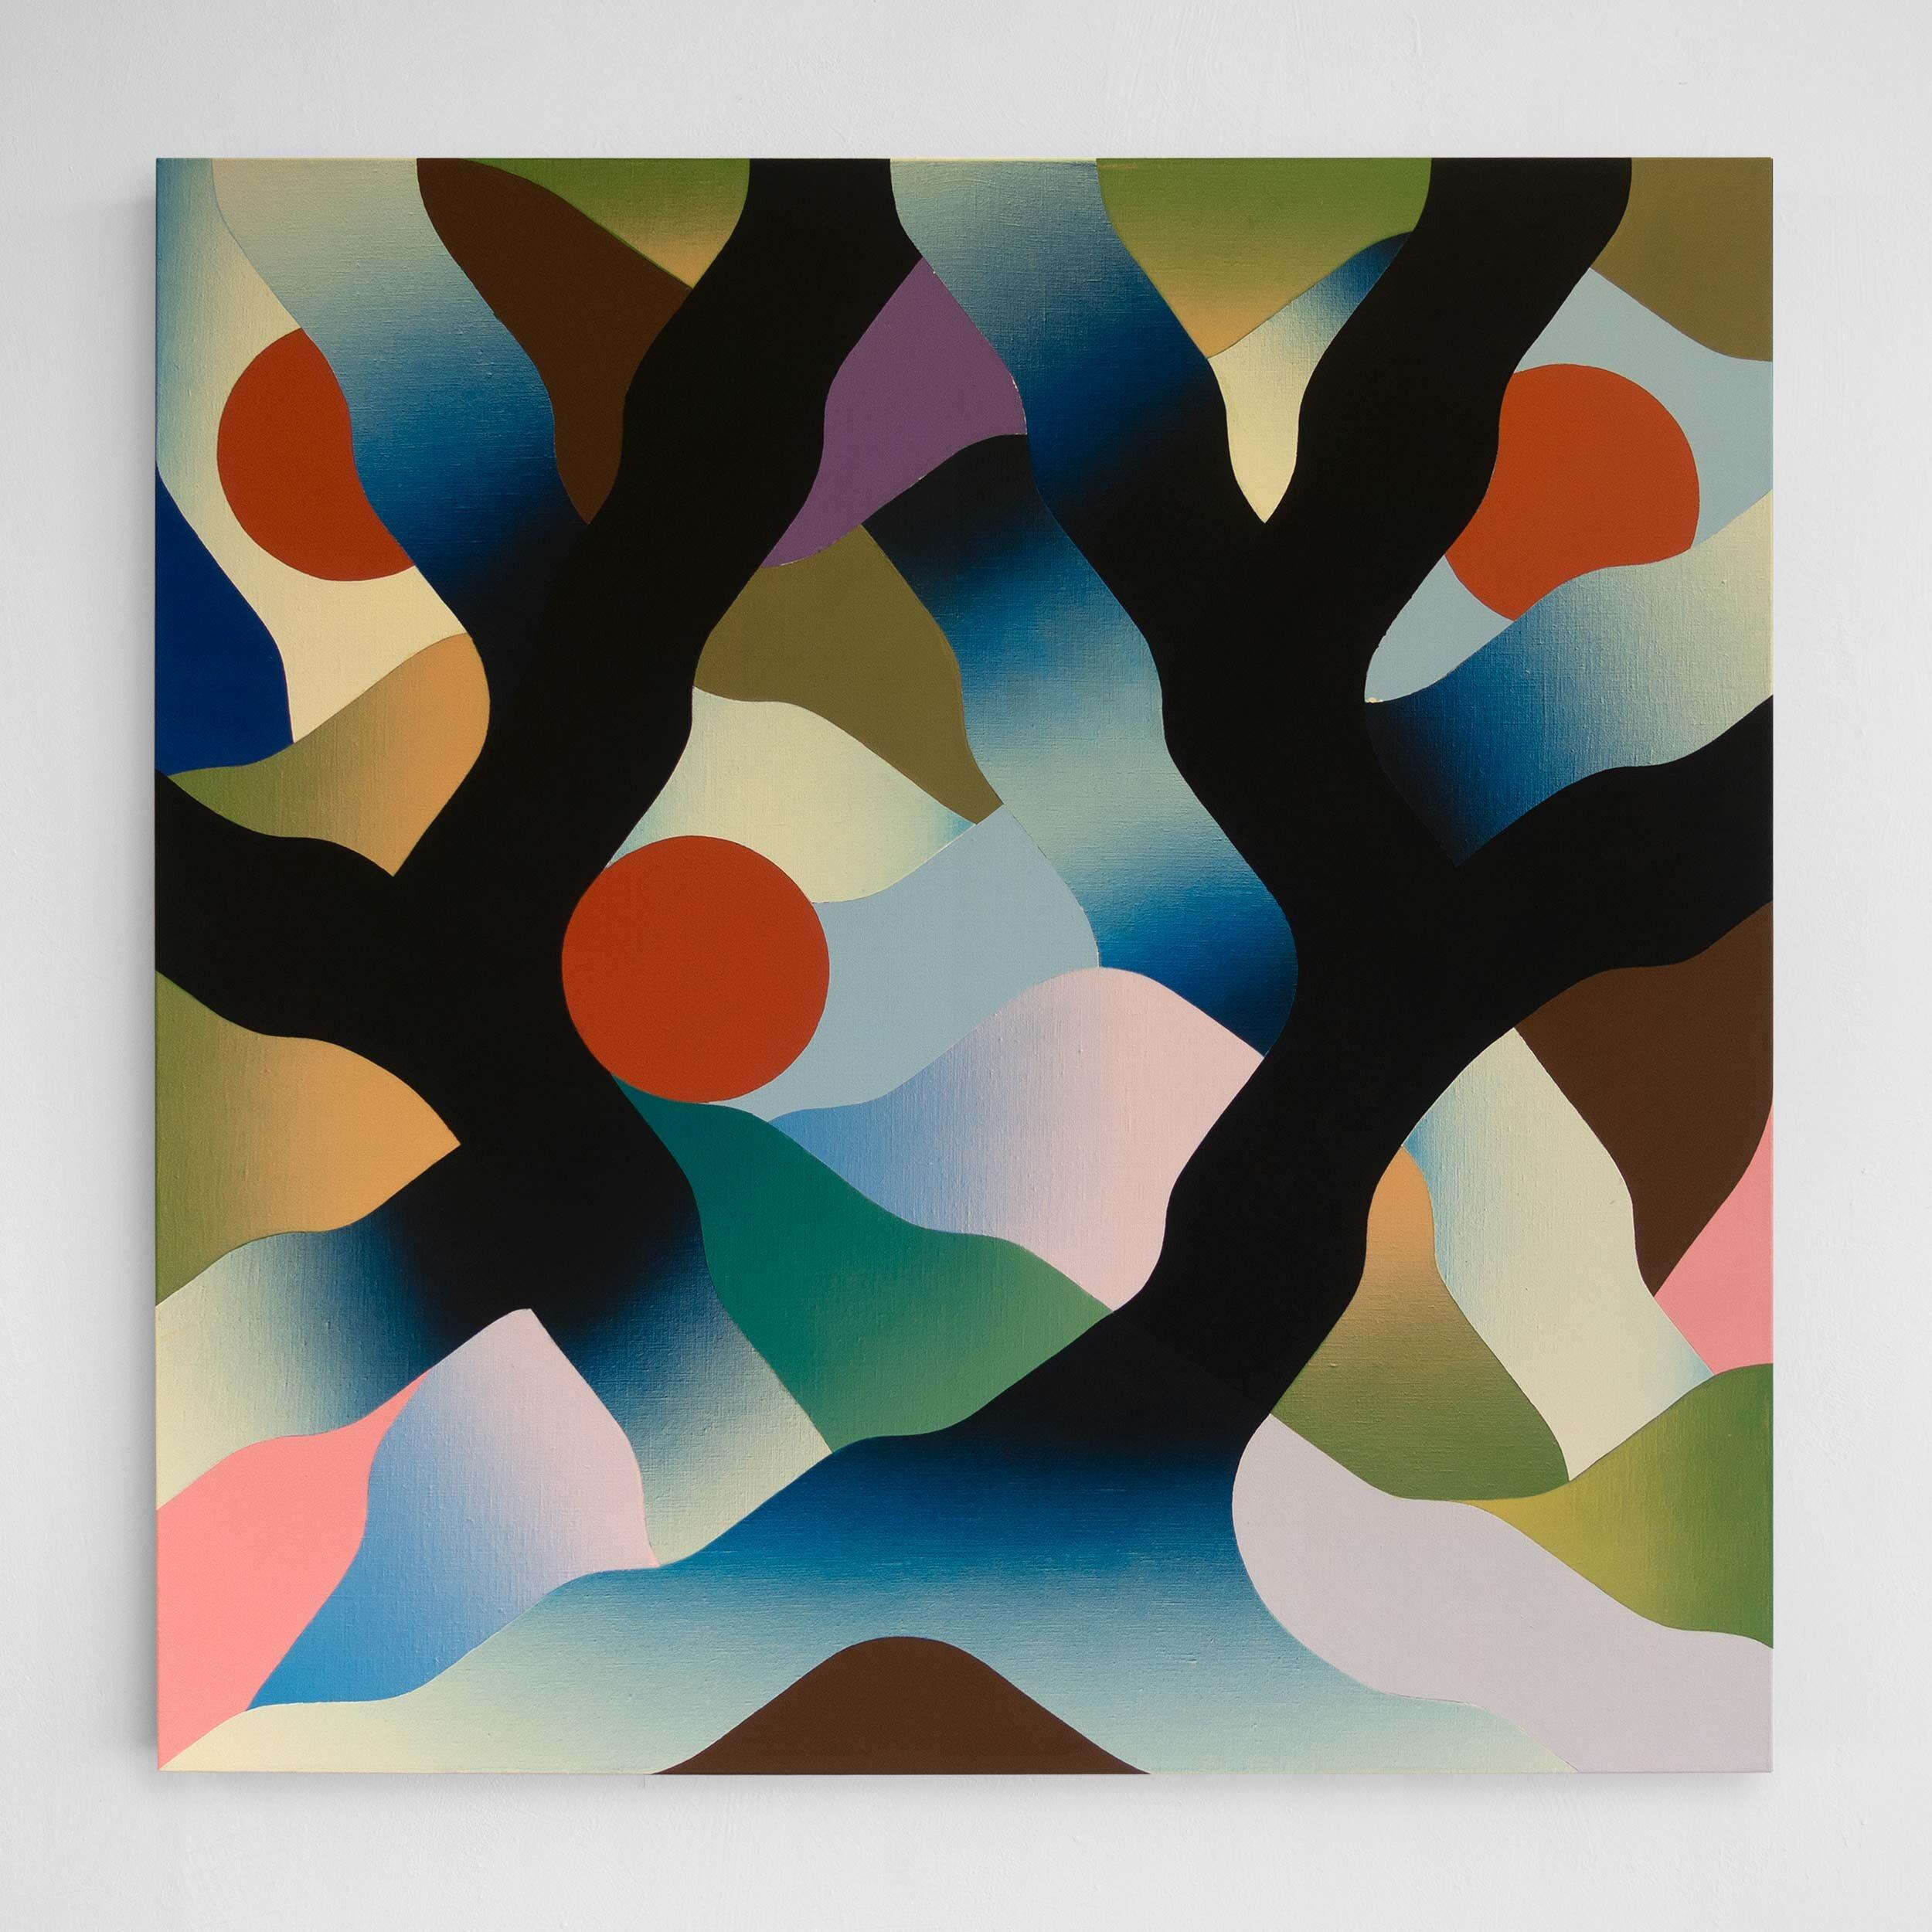 Liana  97 x 97 cm | acrylic & airbrush on linen | 2019